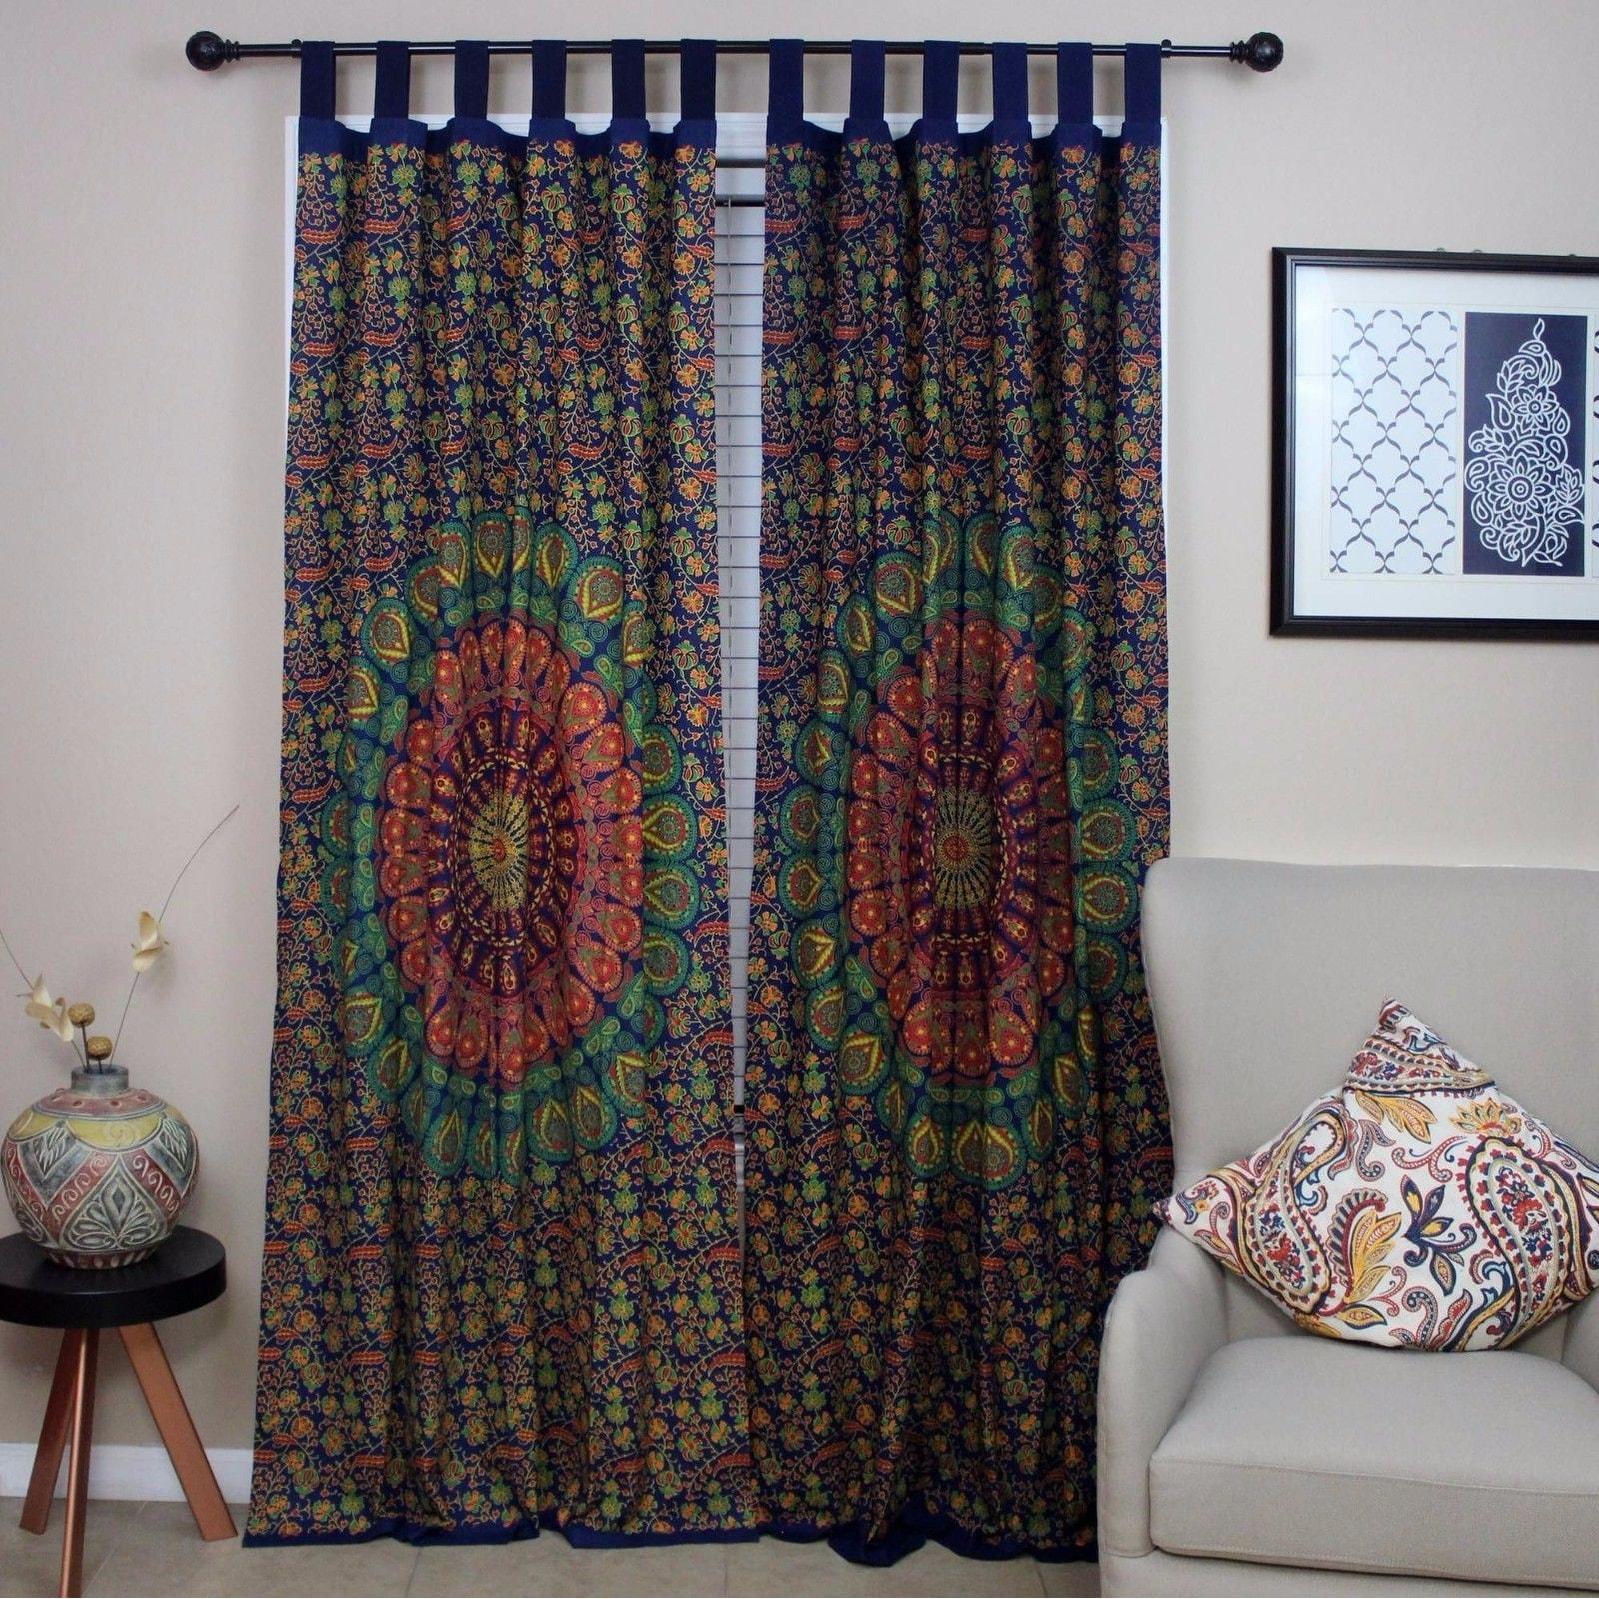 Handmade Floral Mandala Peacock 100% Cotton Tab Top Curtain Drape Panel 44x88 Inches - 44 x 88 - Thumbnail 0